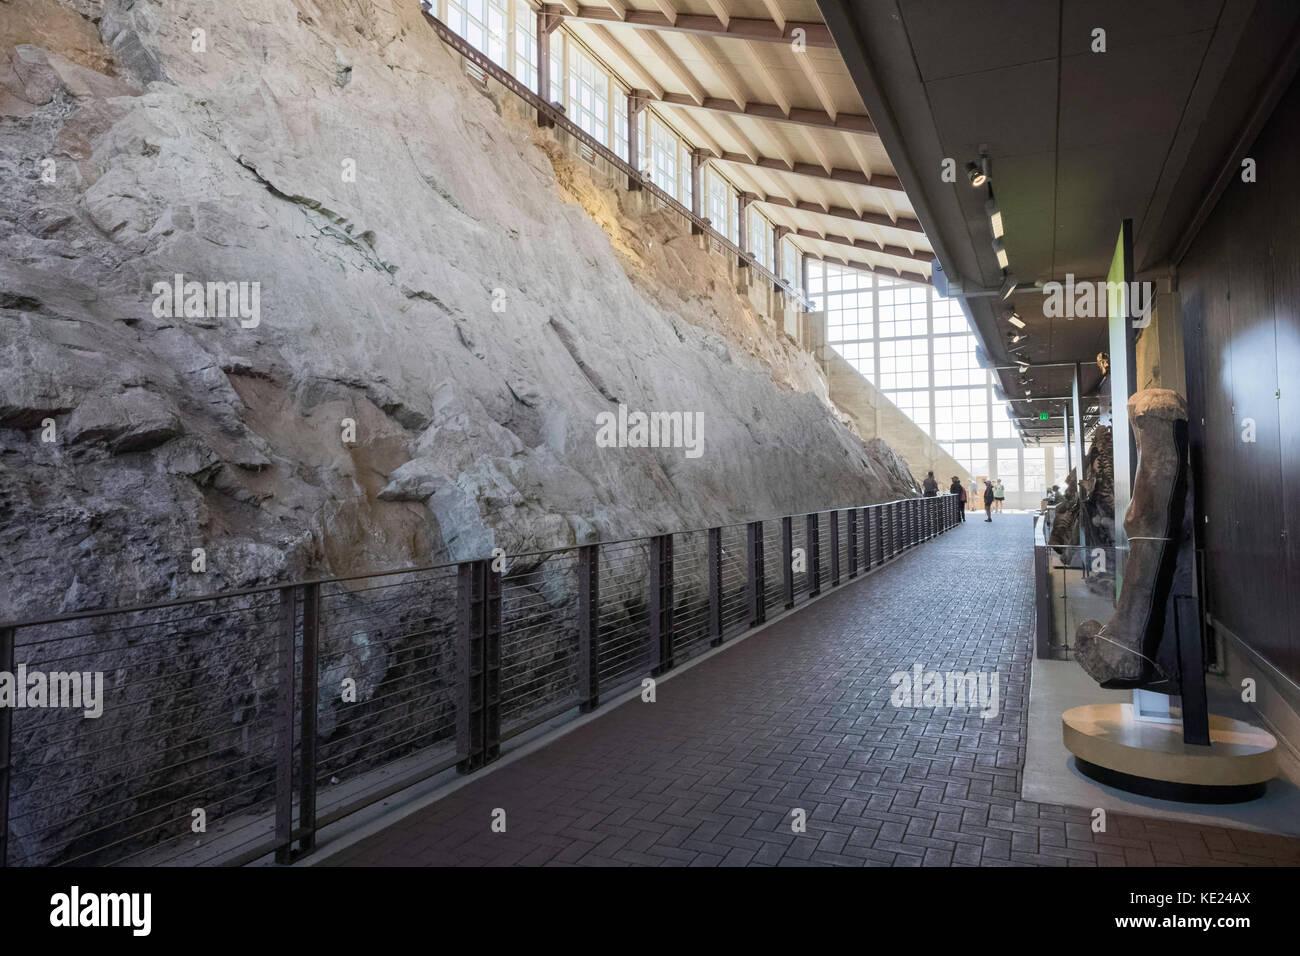 Dinosaur Quarry Exhibit, Dinosaur National Monument, Utah, USA - Stock Image